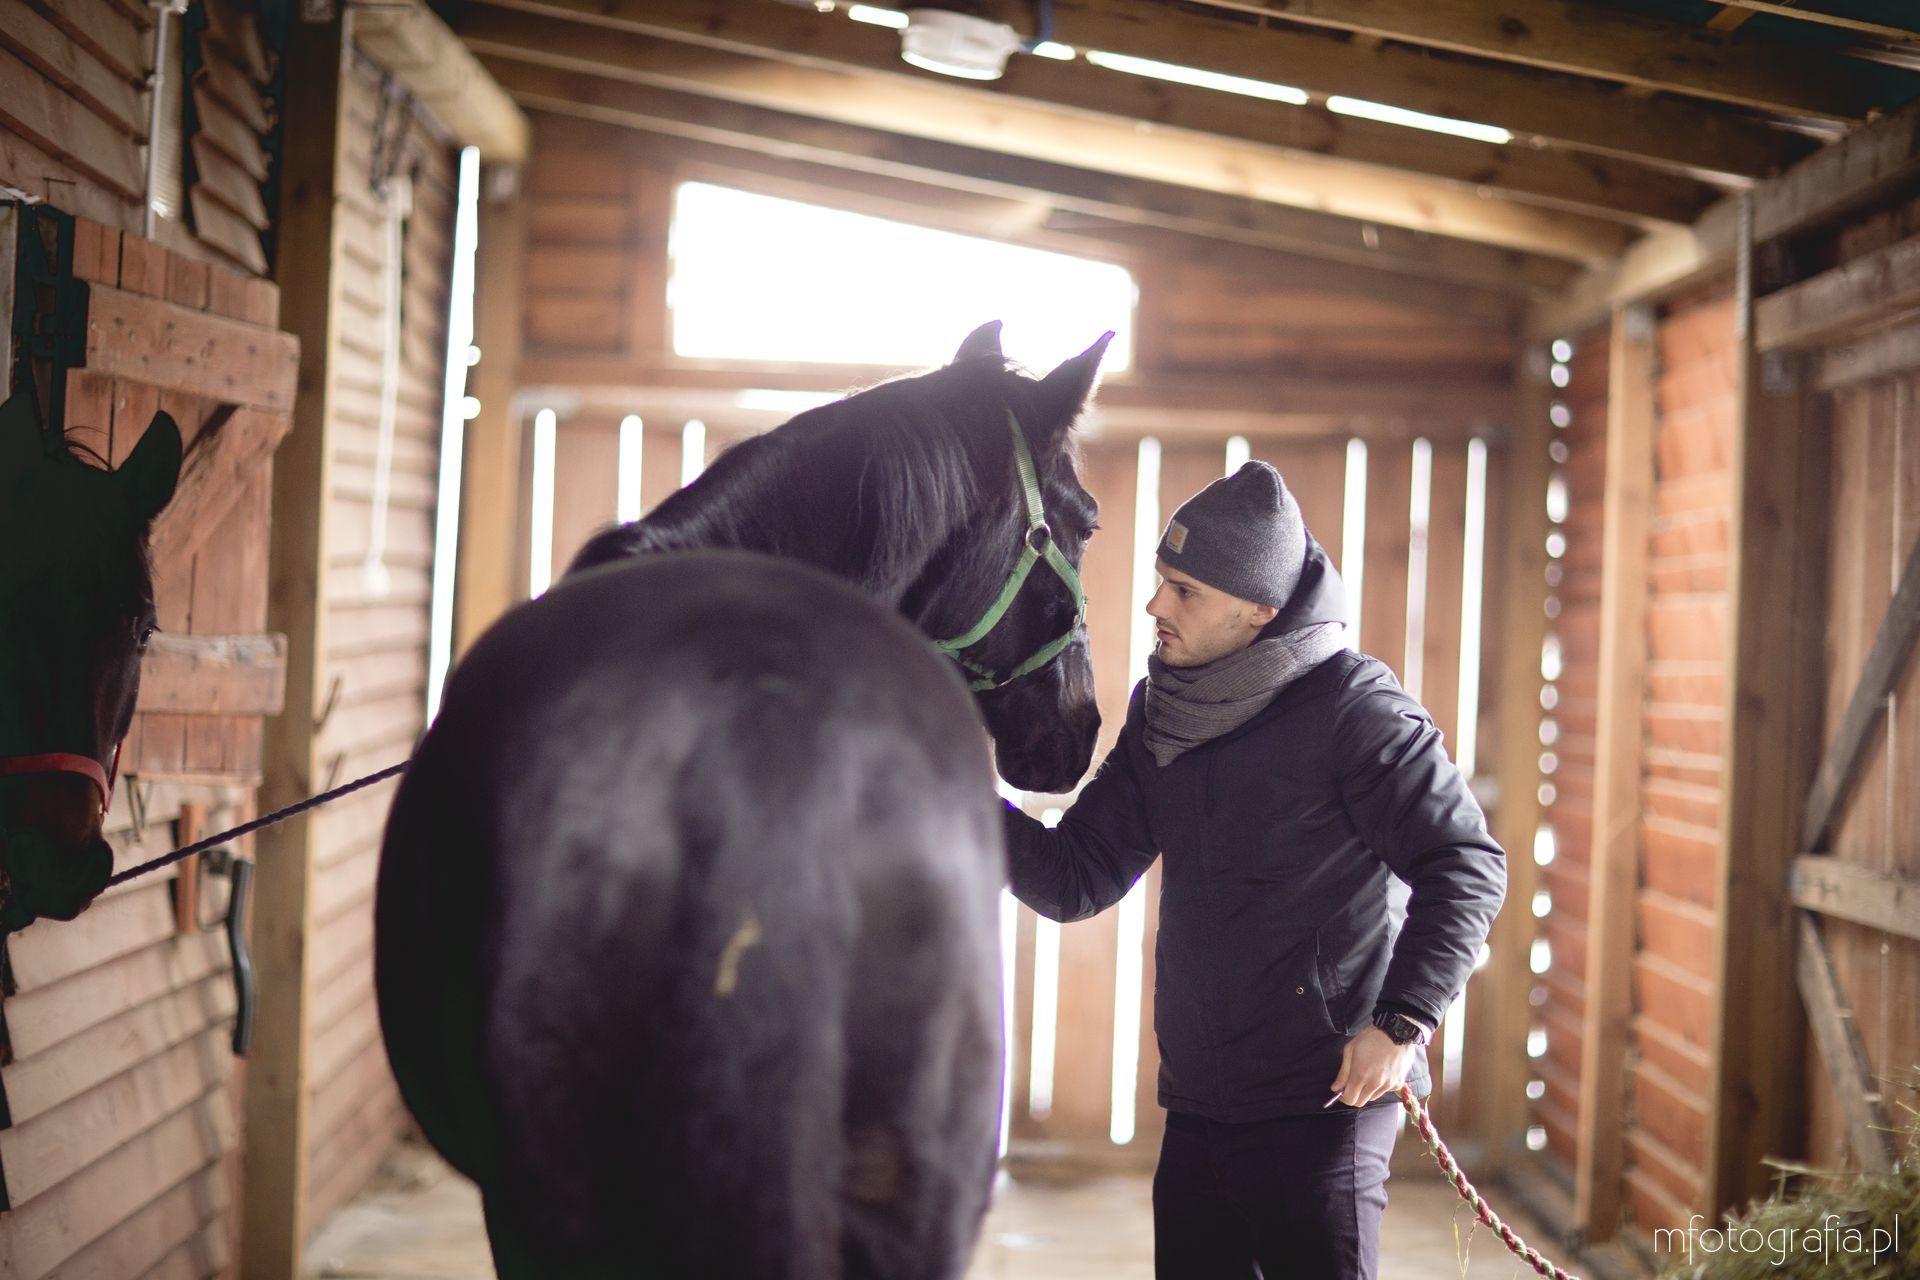 zdjecia koni w stajni